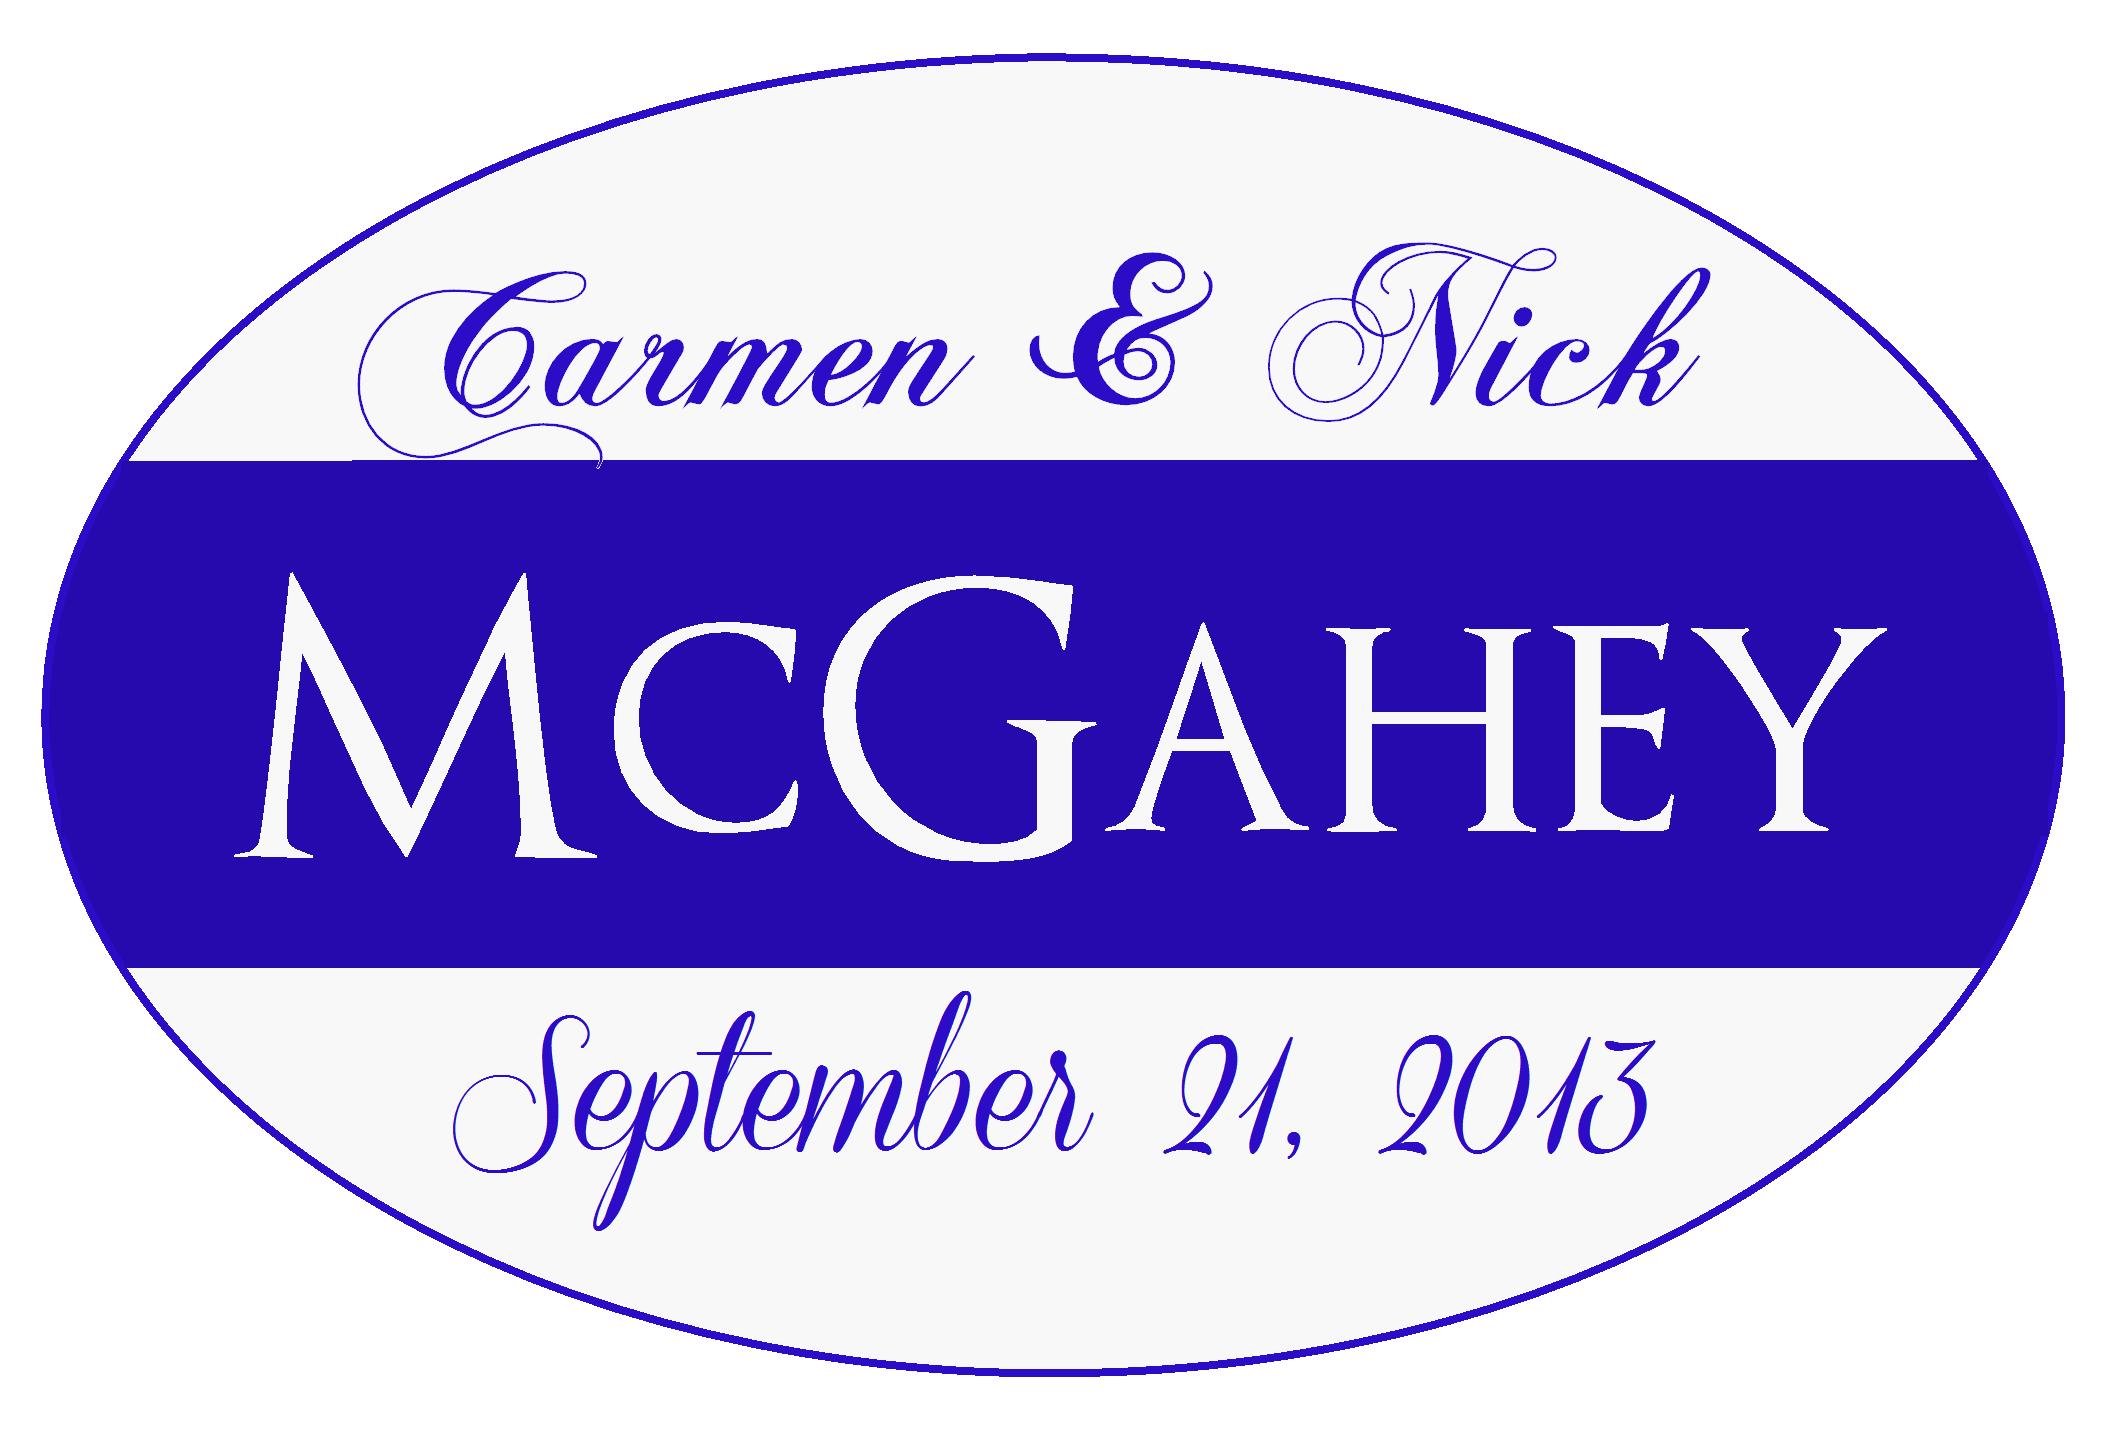 mcgahey logo4.png